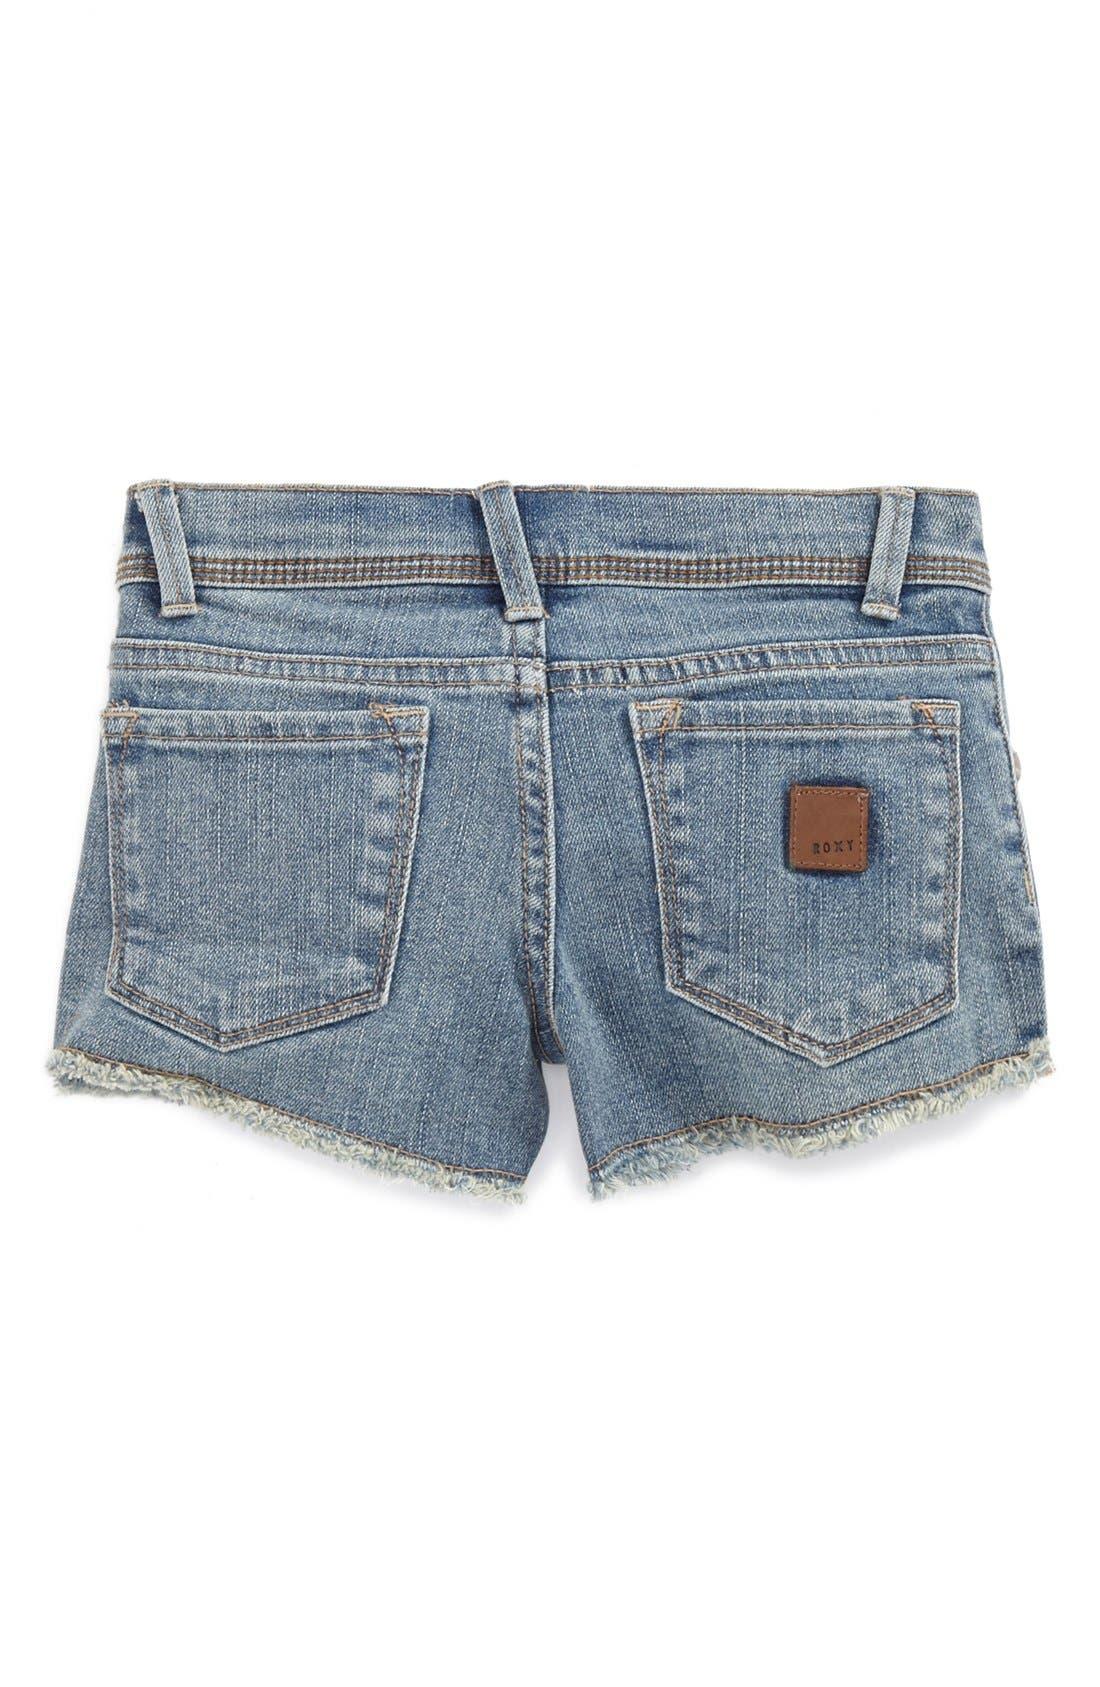 Main Image - Roxy 'Blaze' Denim Shorts (Little Girls)